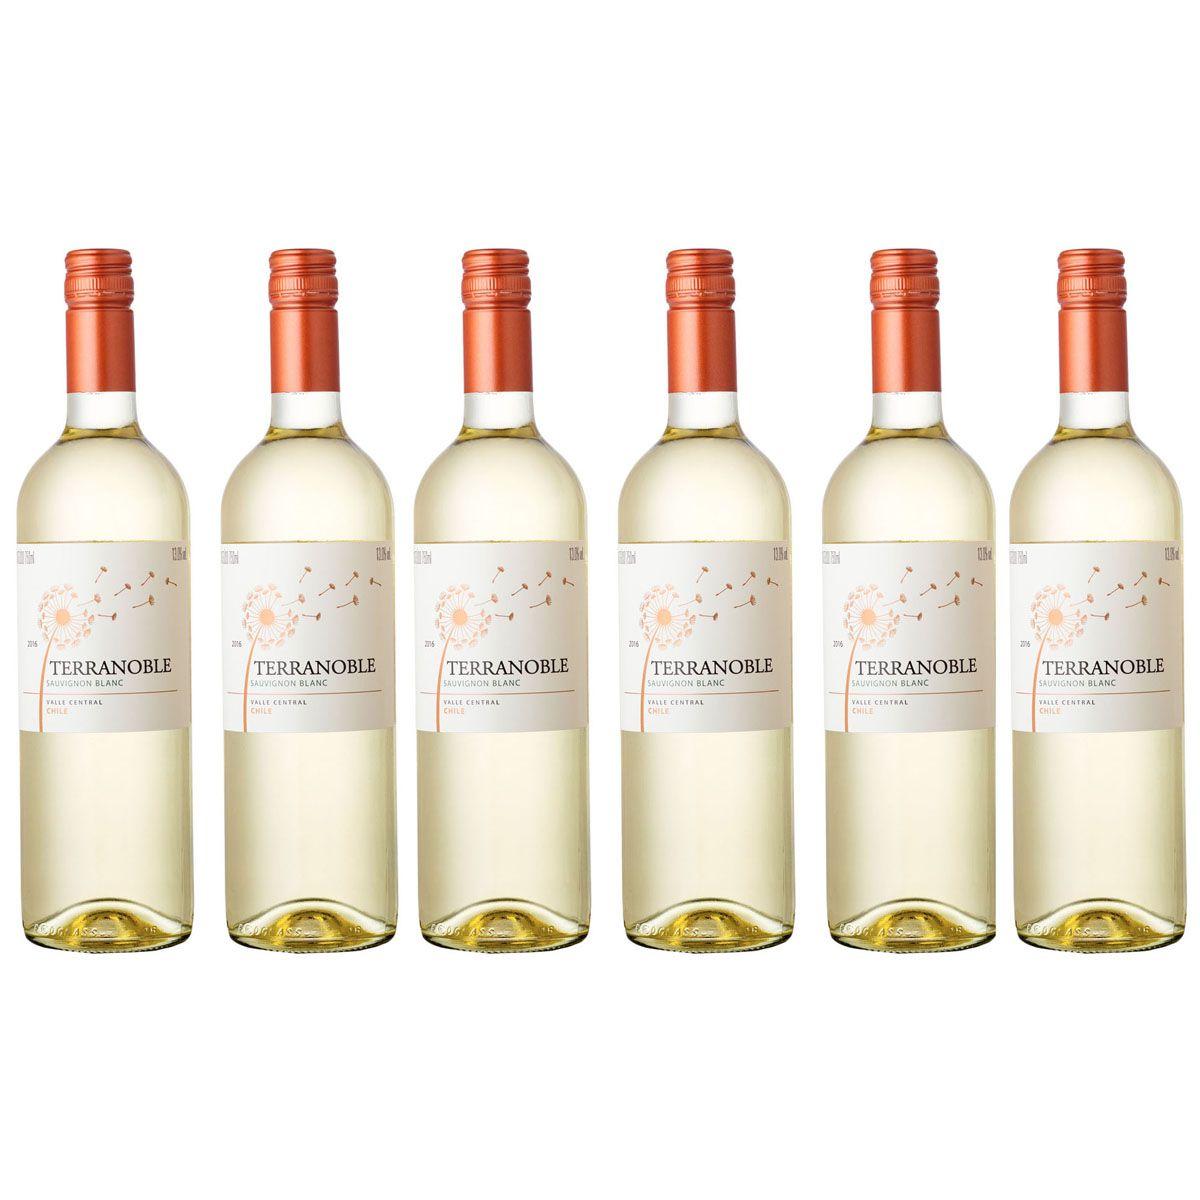 Kit com 6 Garrafas Terranoble Sauvignon Blanc